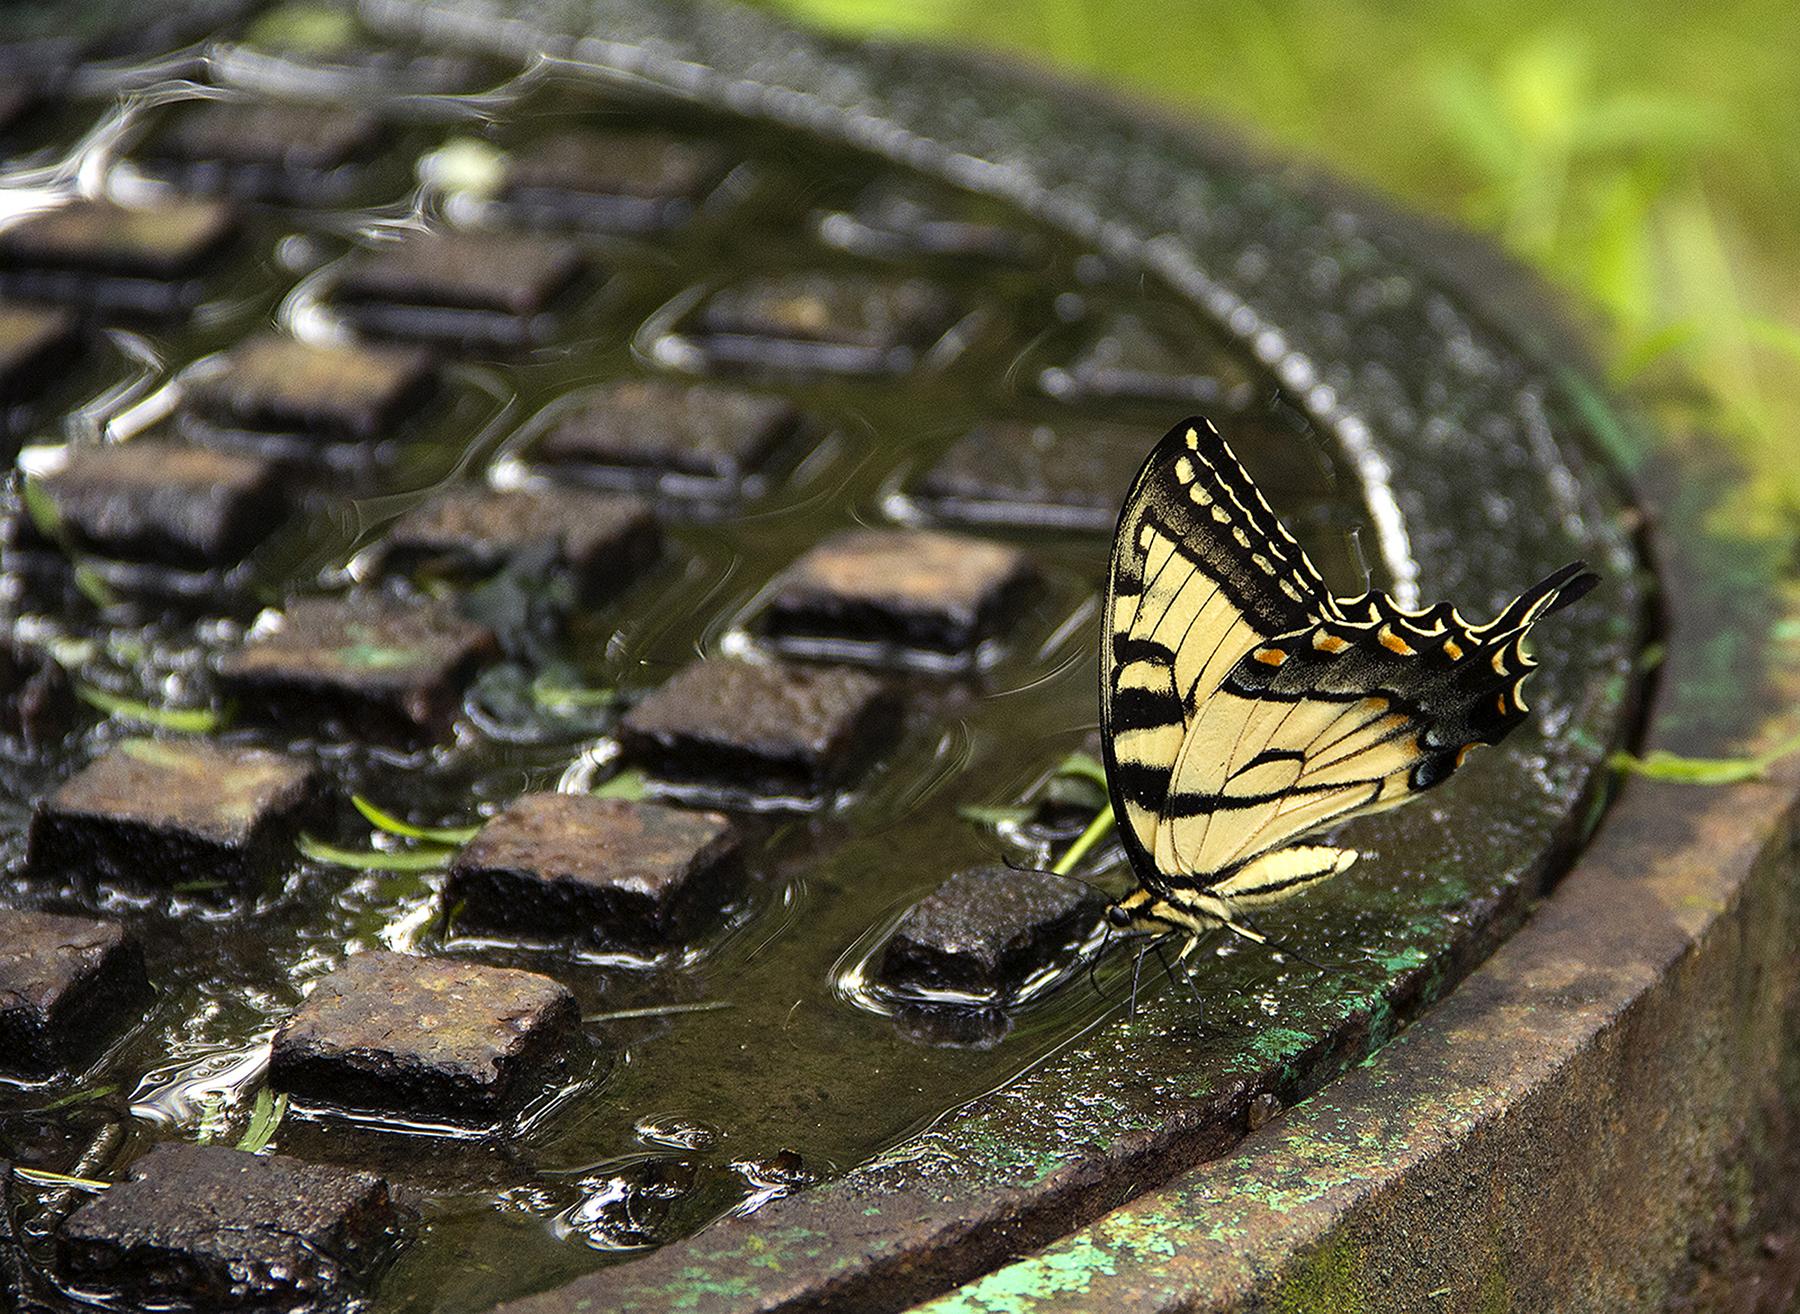 Hanewinckel_0584a_Butterfly at Rest.jpg